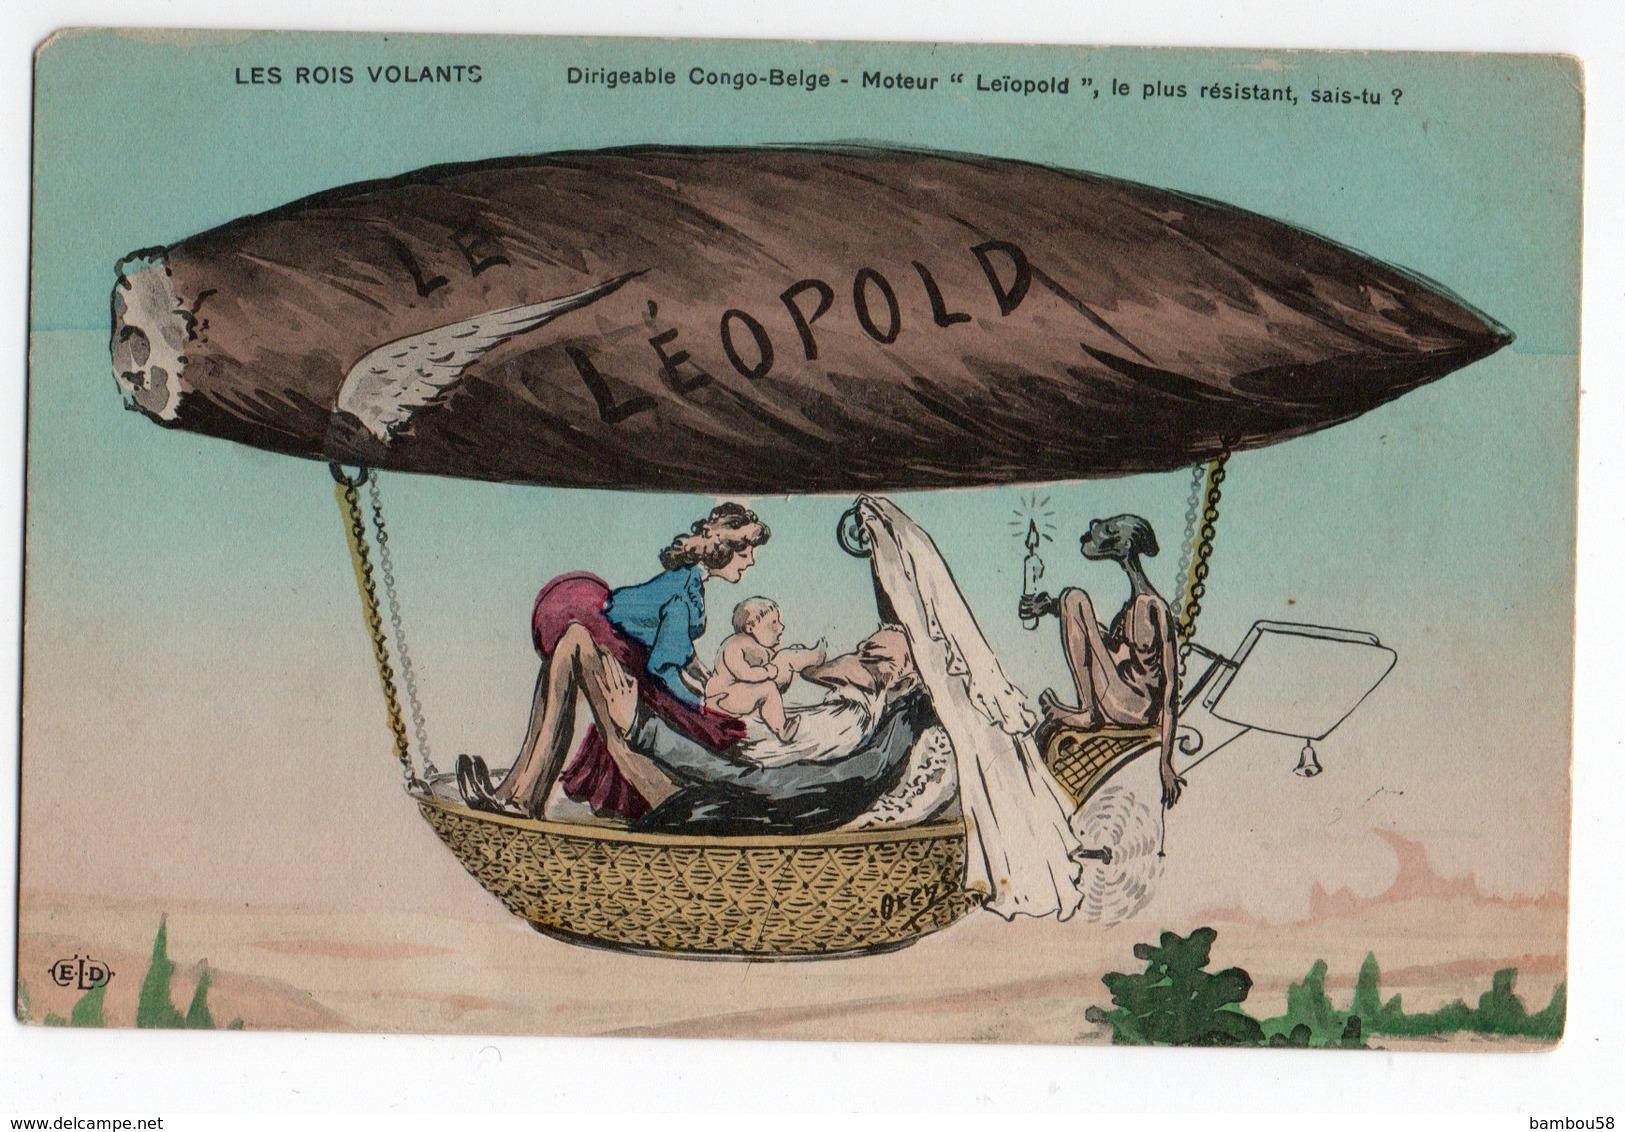 CIGARE * LES ROIS VOLANTS * DIDIGEABLE CONGO-BELGE * LEÎOPOLD * ELD * ORENS - Orens